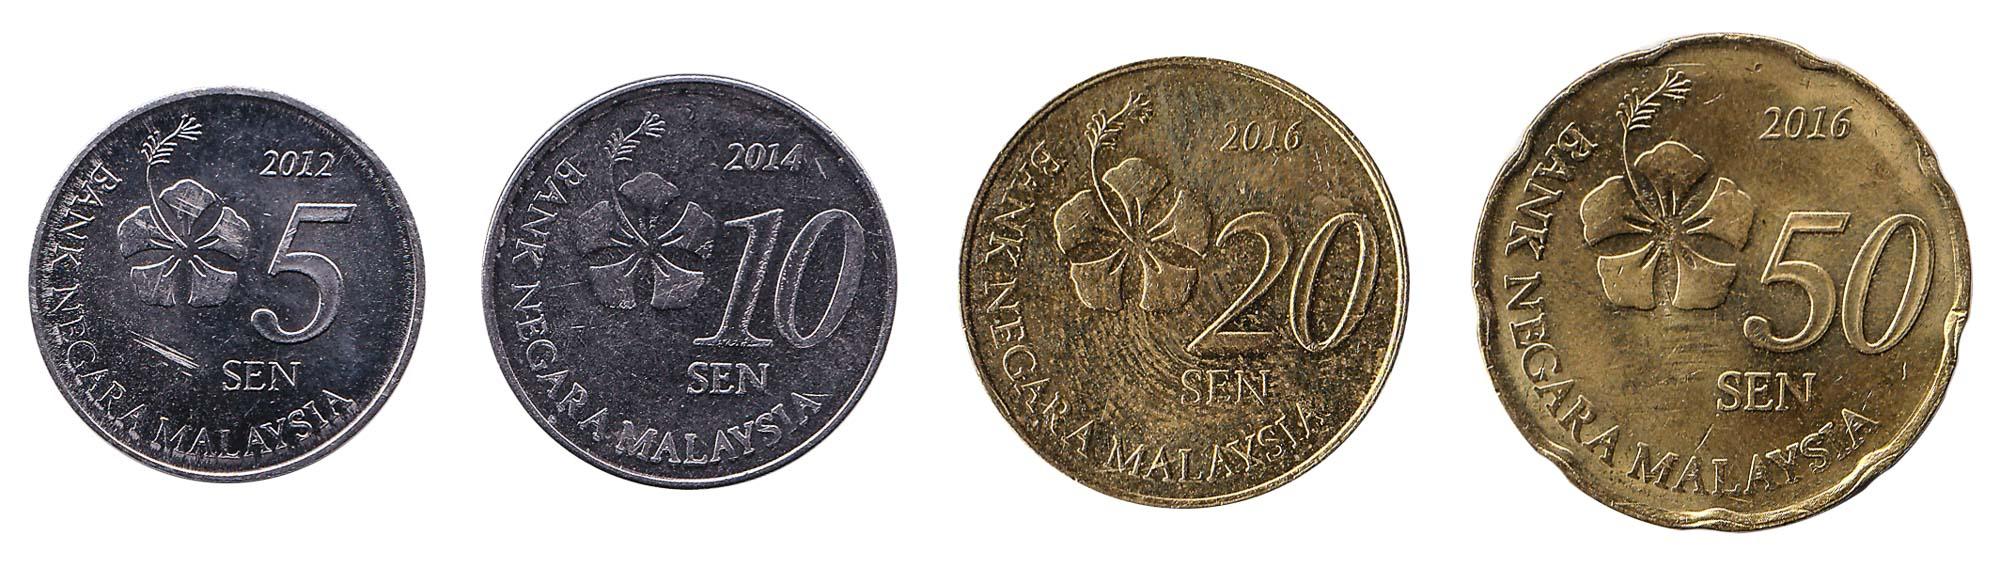 Malaysian ringgit coins